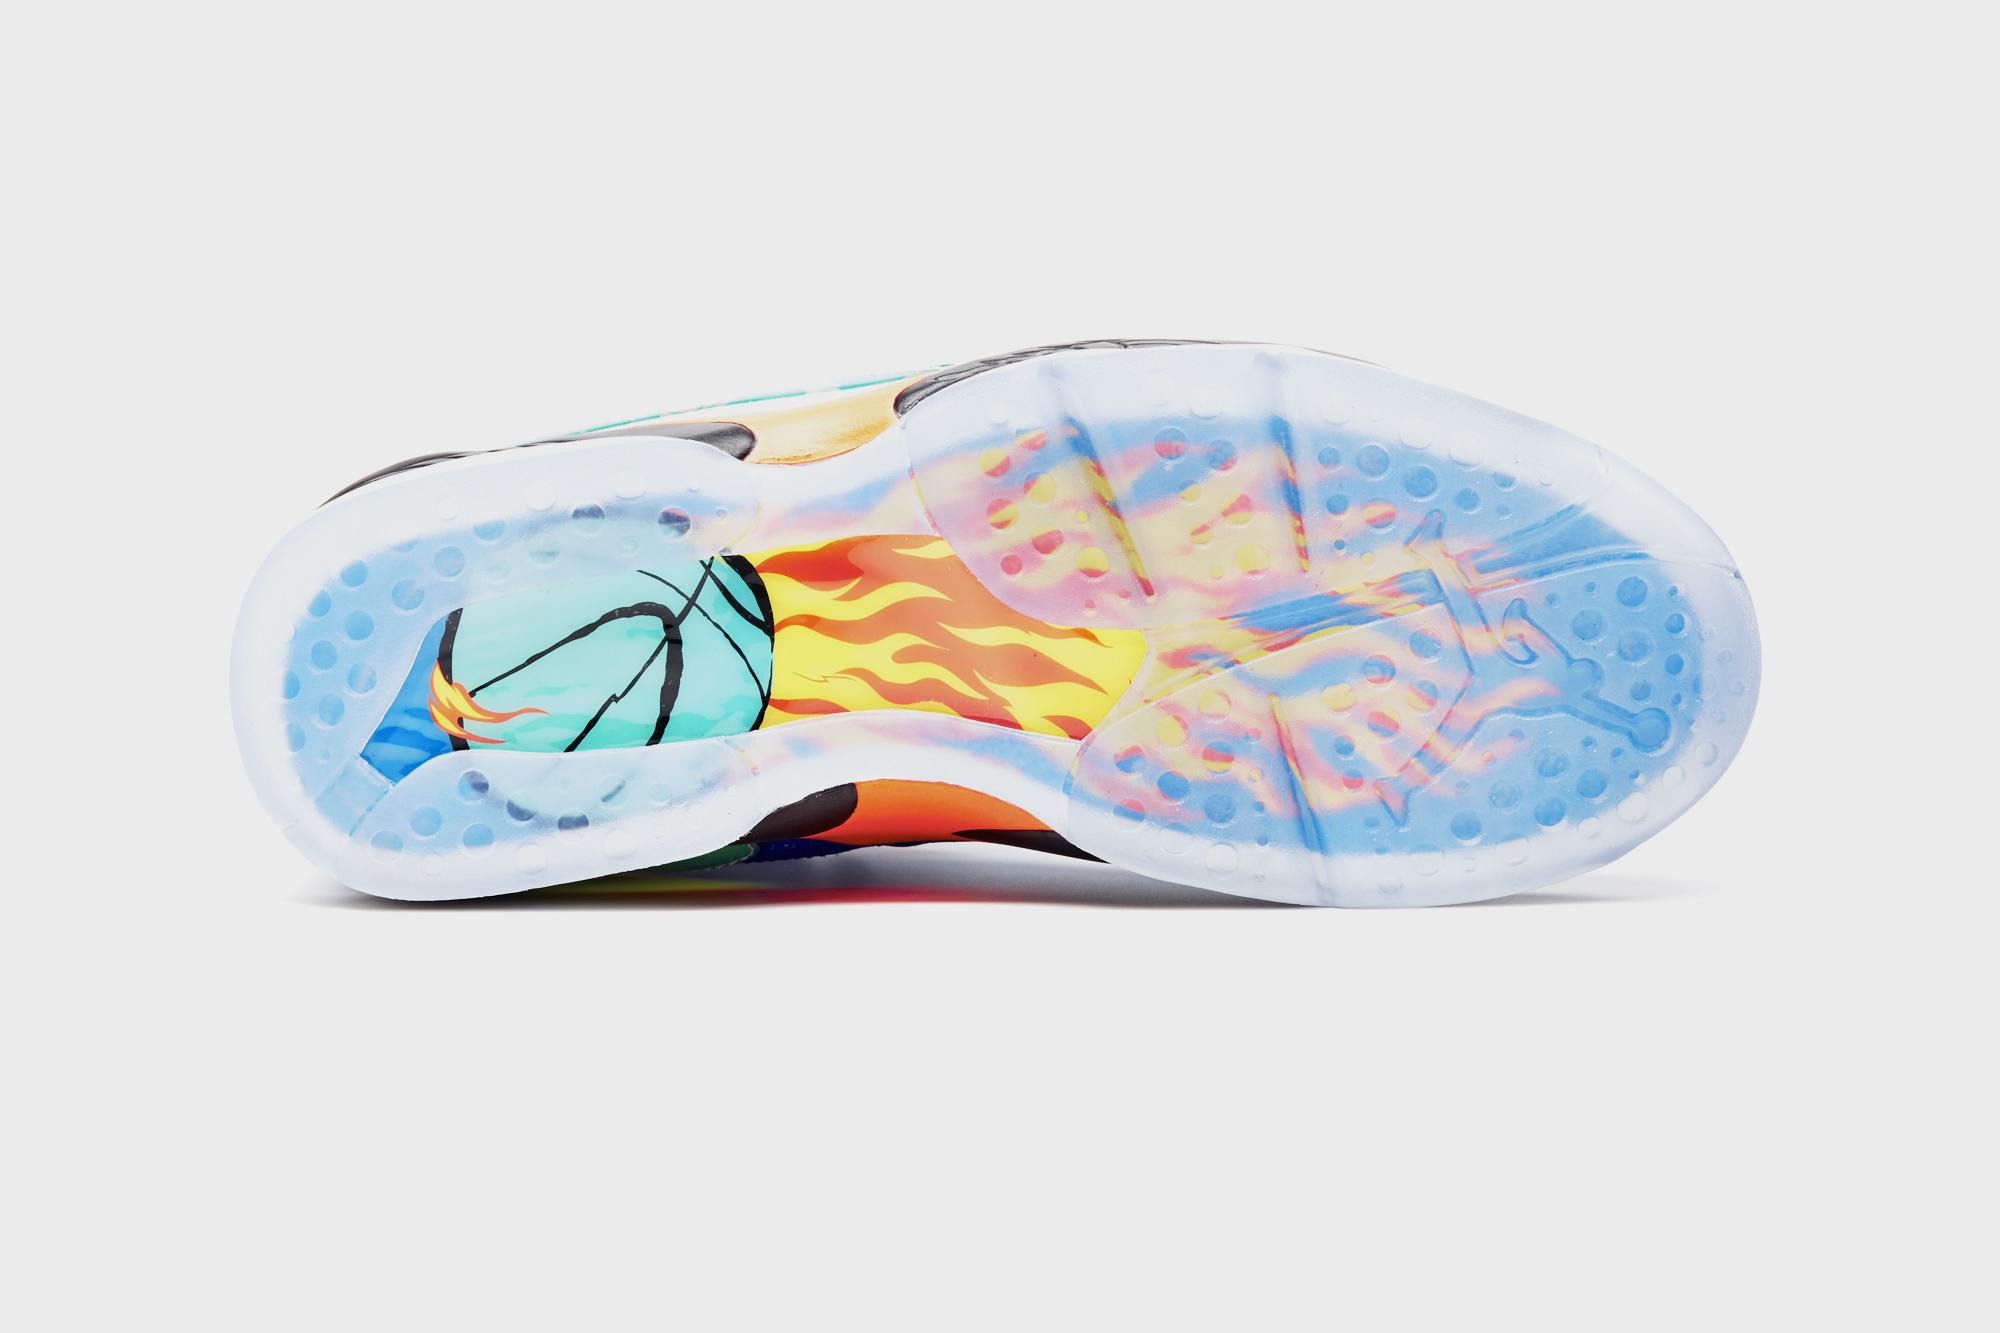 709106b18e1 Caden's Air Jordan 8 Retro DB Color: Hyper Blue/Electro Orange-Black-Stadium  Grey-Tour Yellow-Photo Blue Style: 729893-480. Release: 11/23/2014